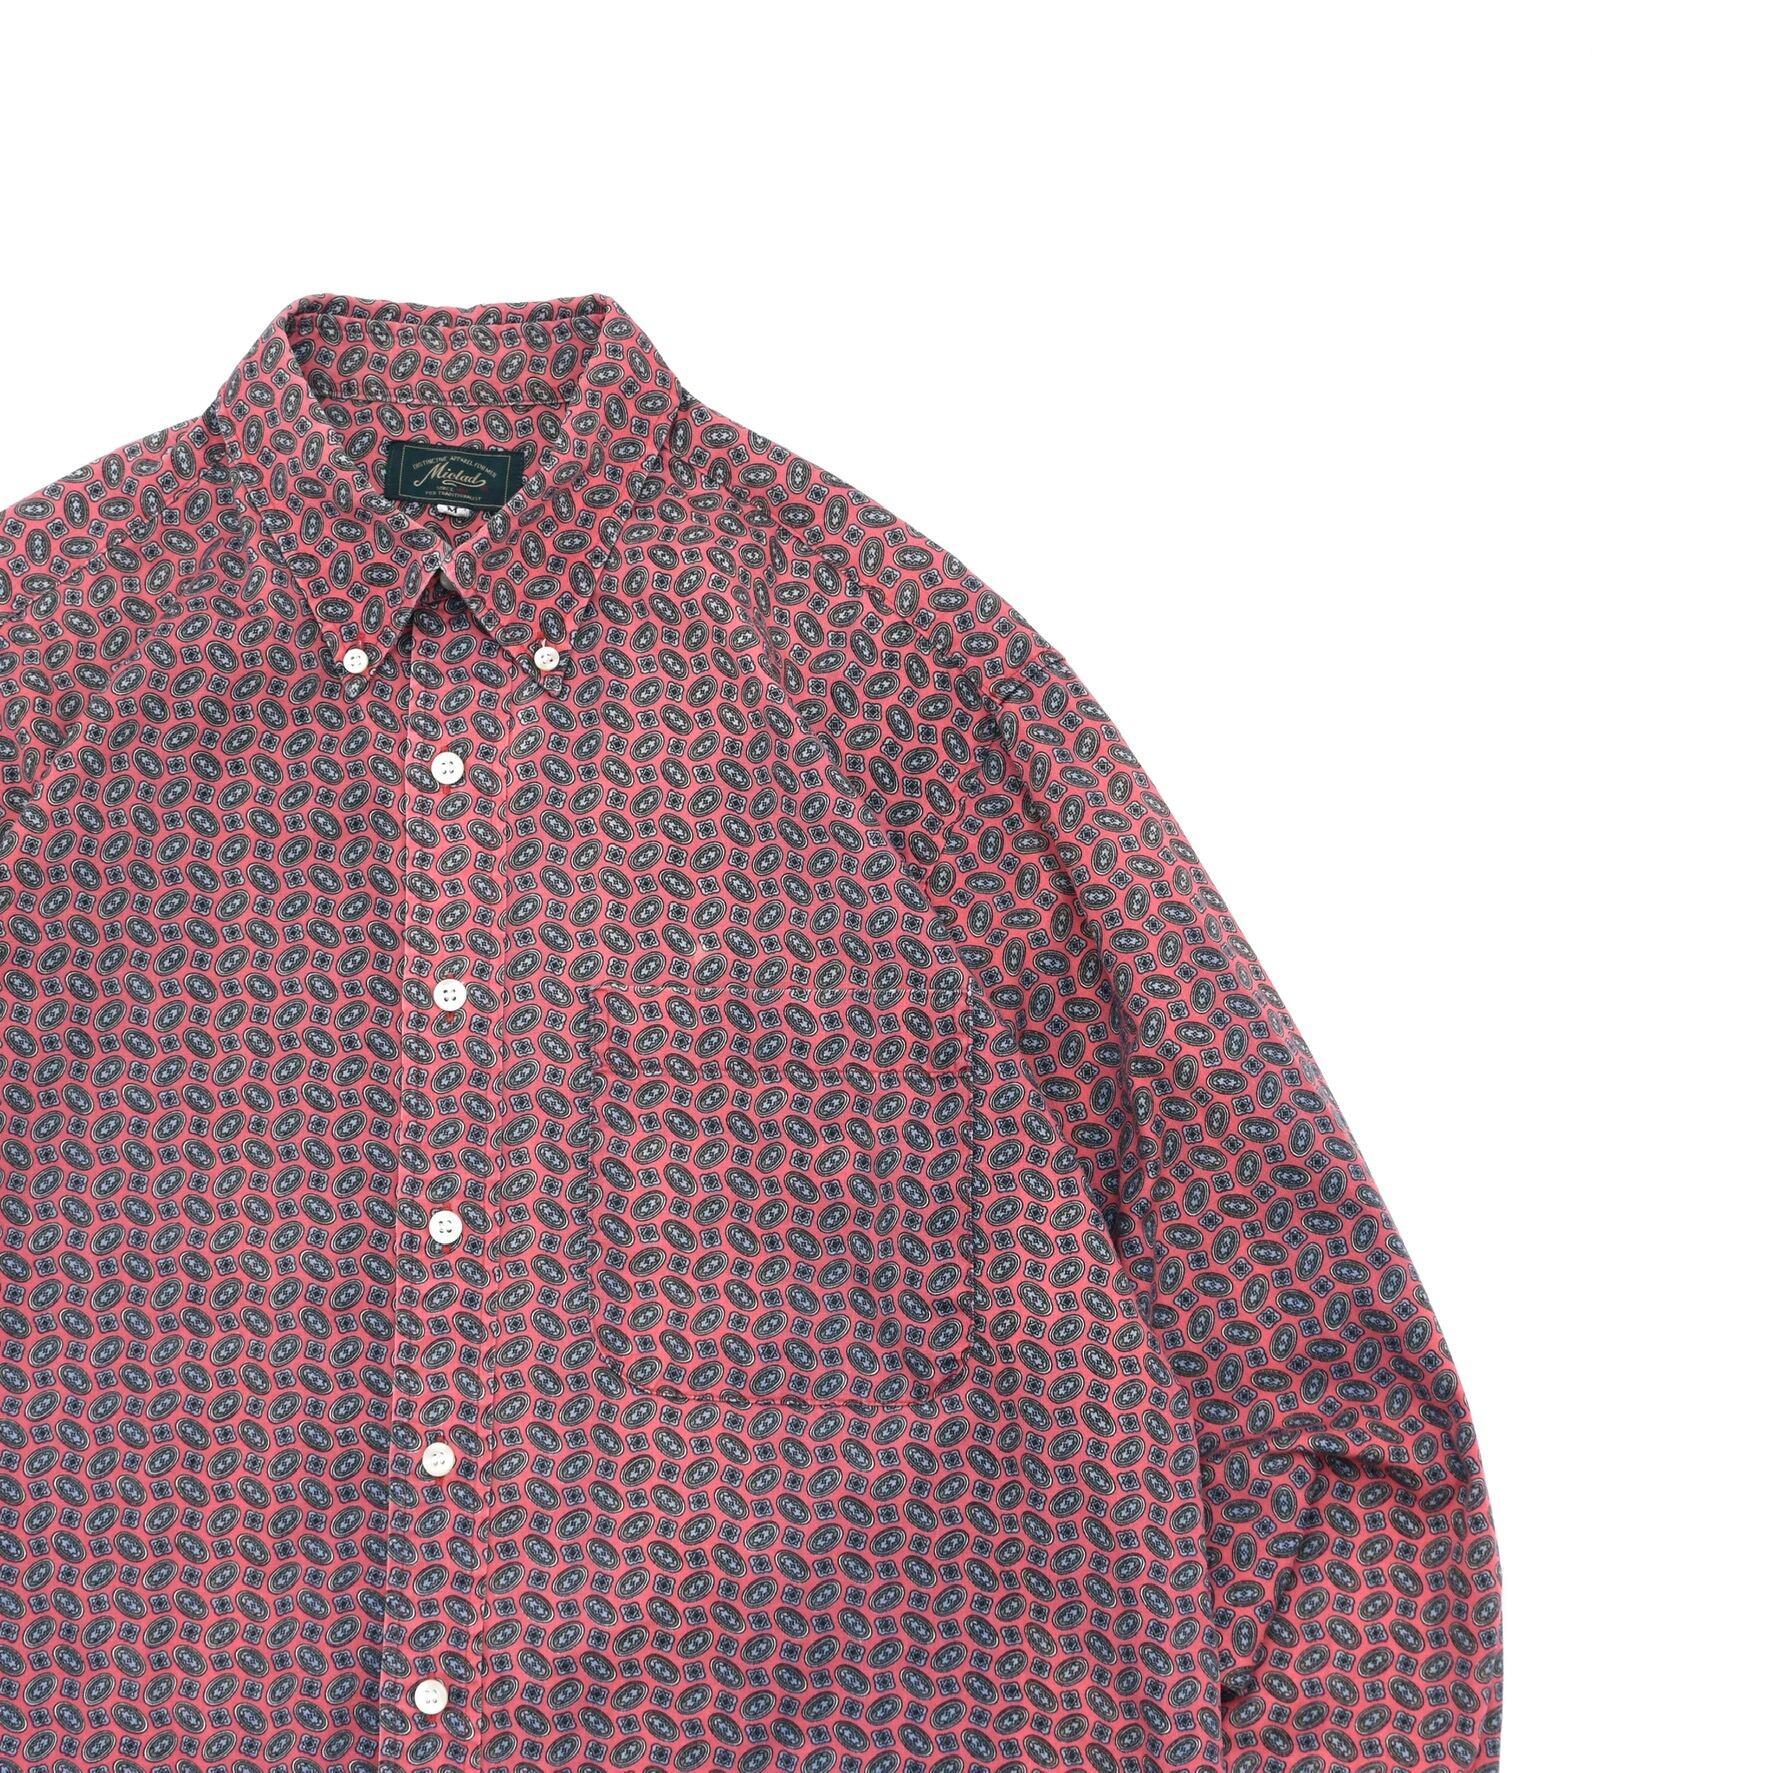 Fine full pattern cotton BD shirt